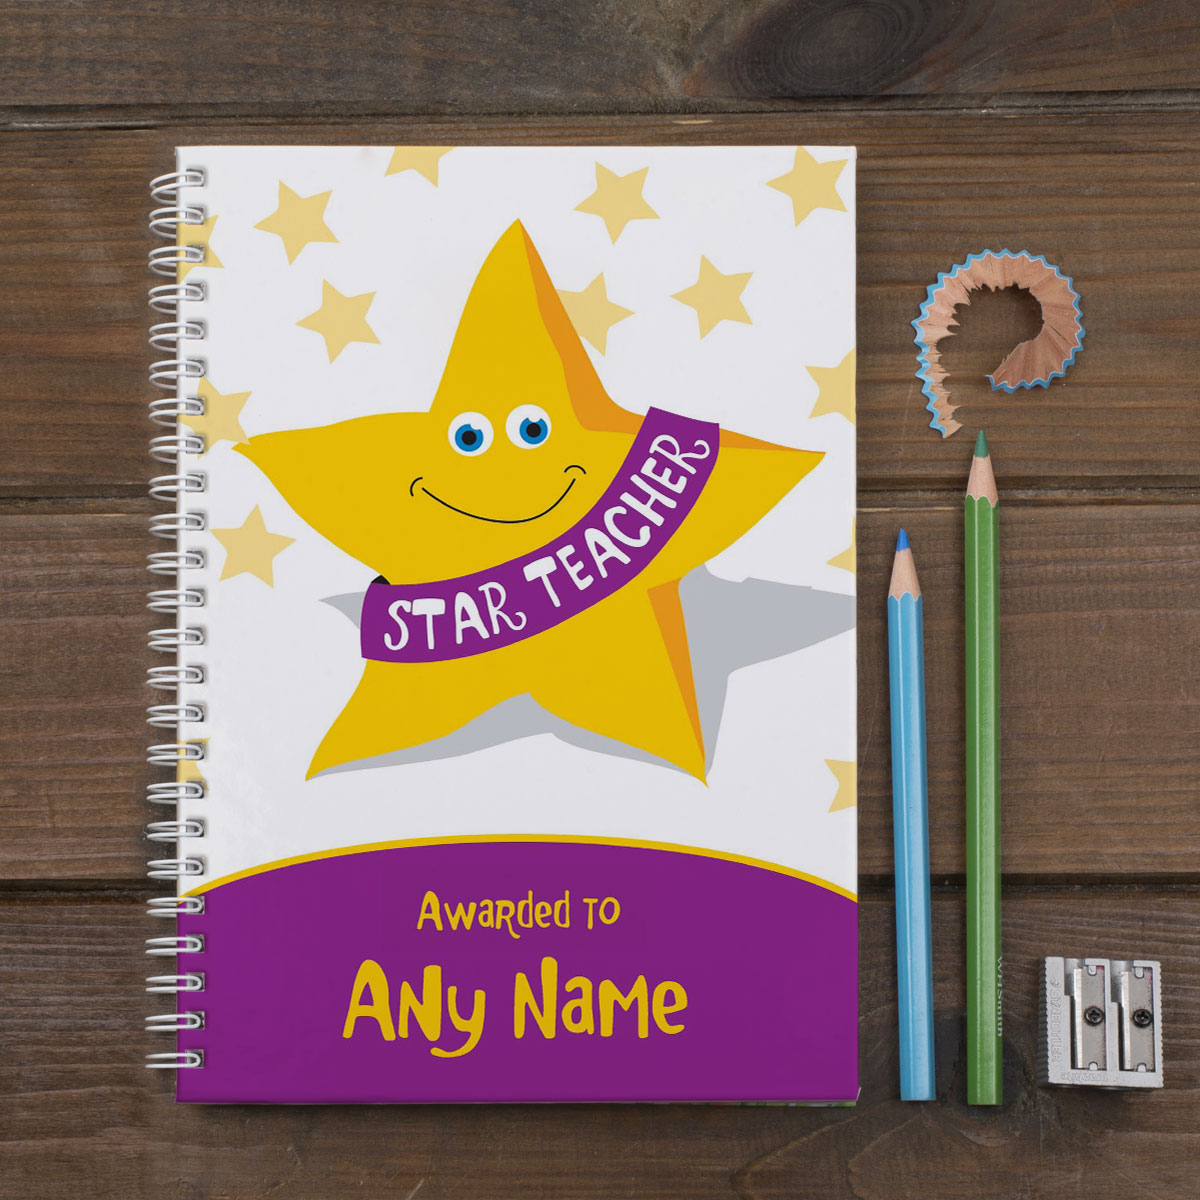 Personalised Notebook - Star Teacher